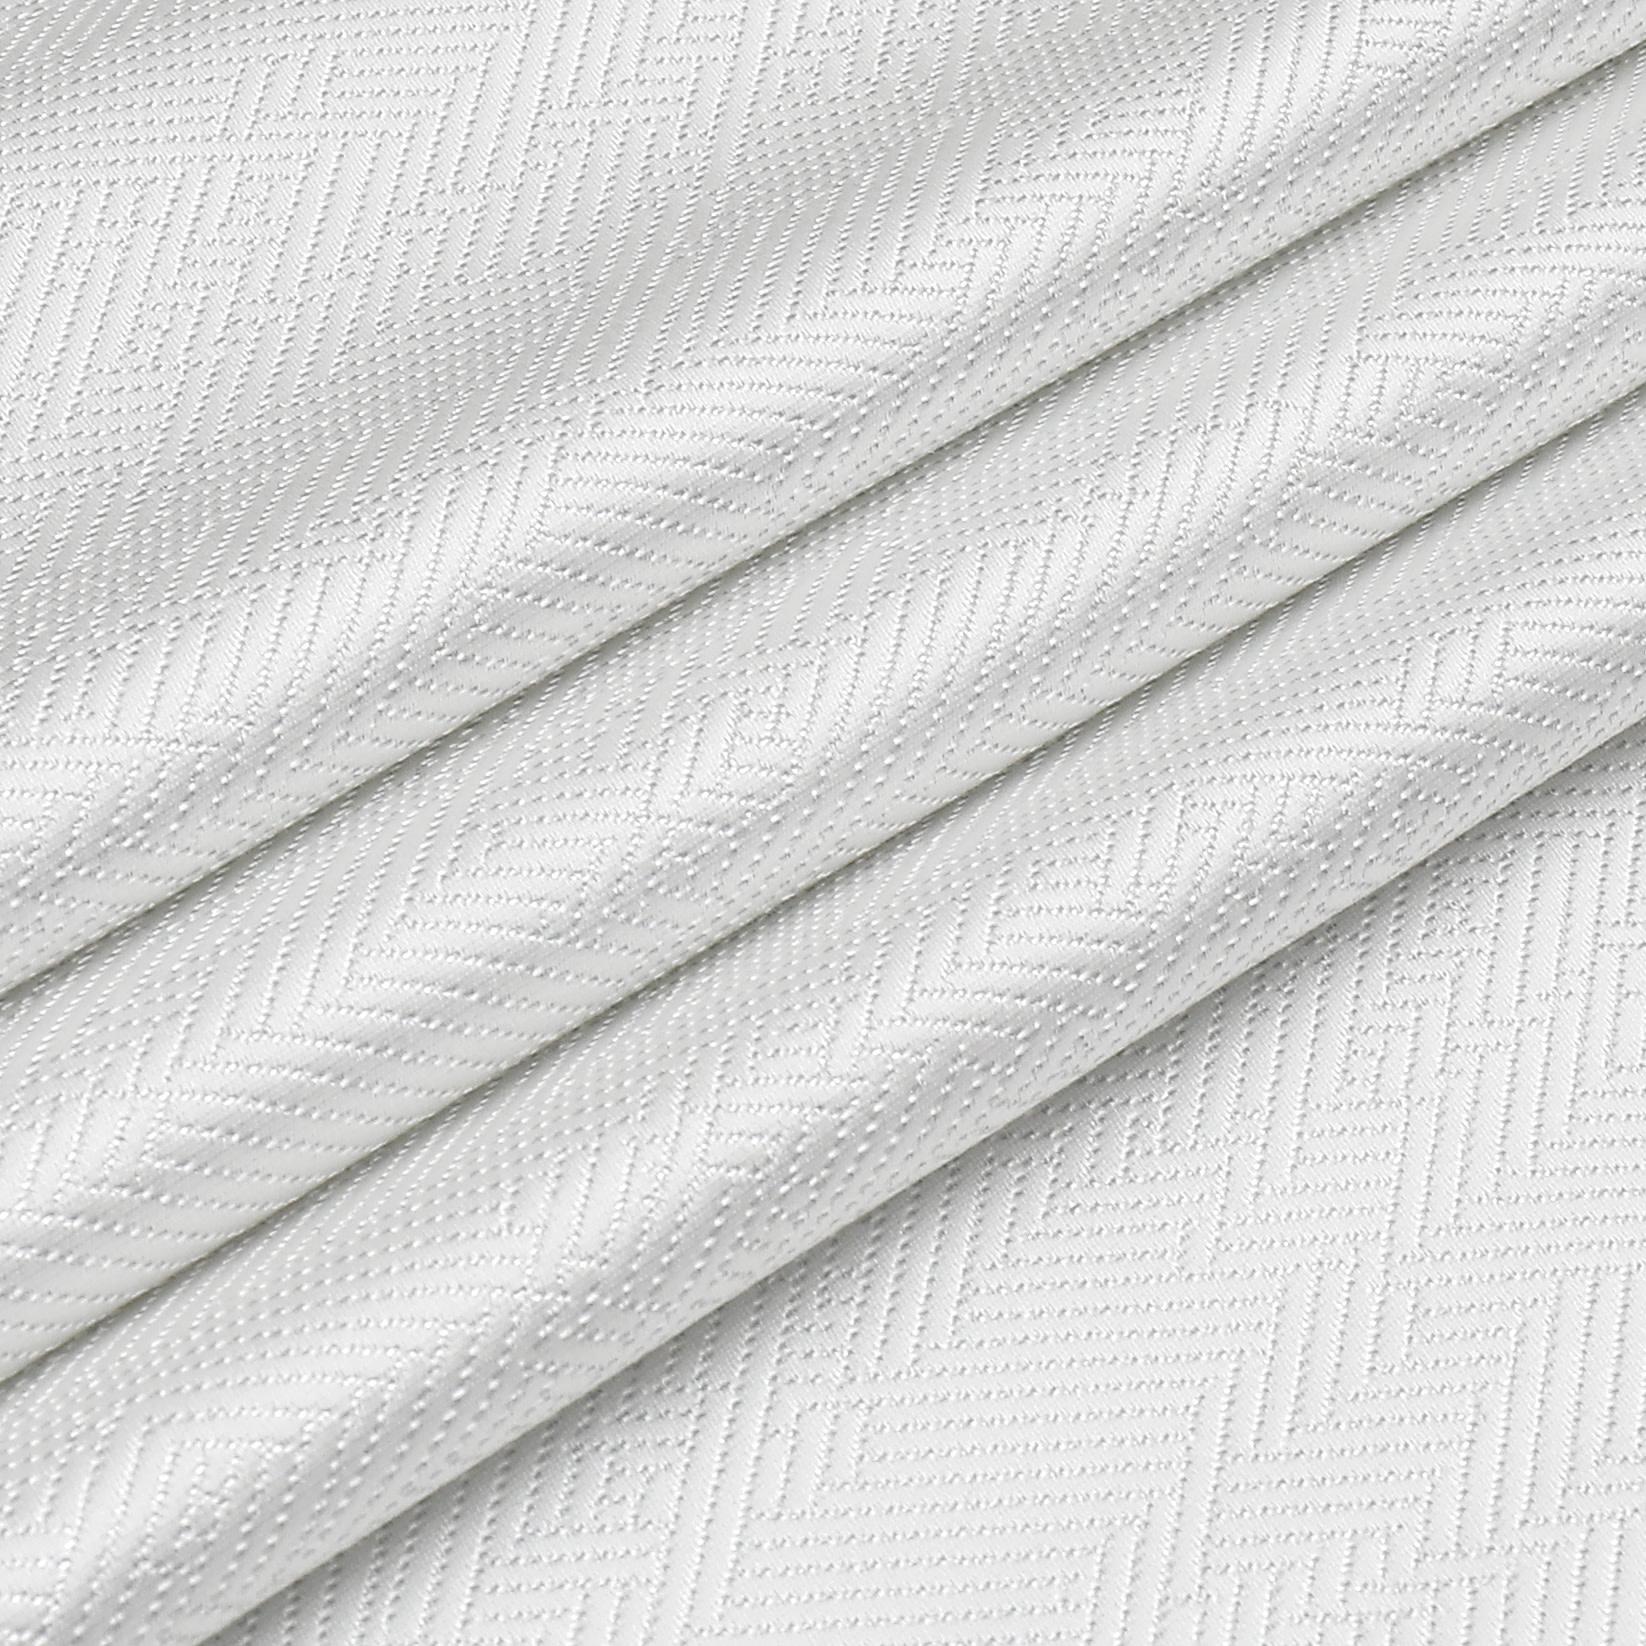 TC1335- 70 x 120 Jacquard  Desert White Silver Tablecloth